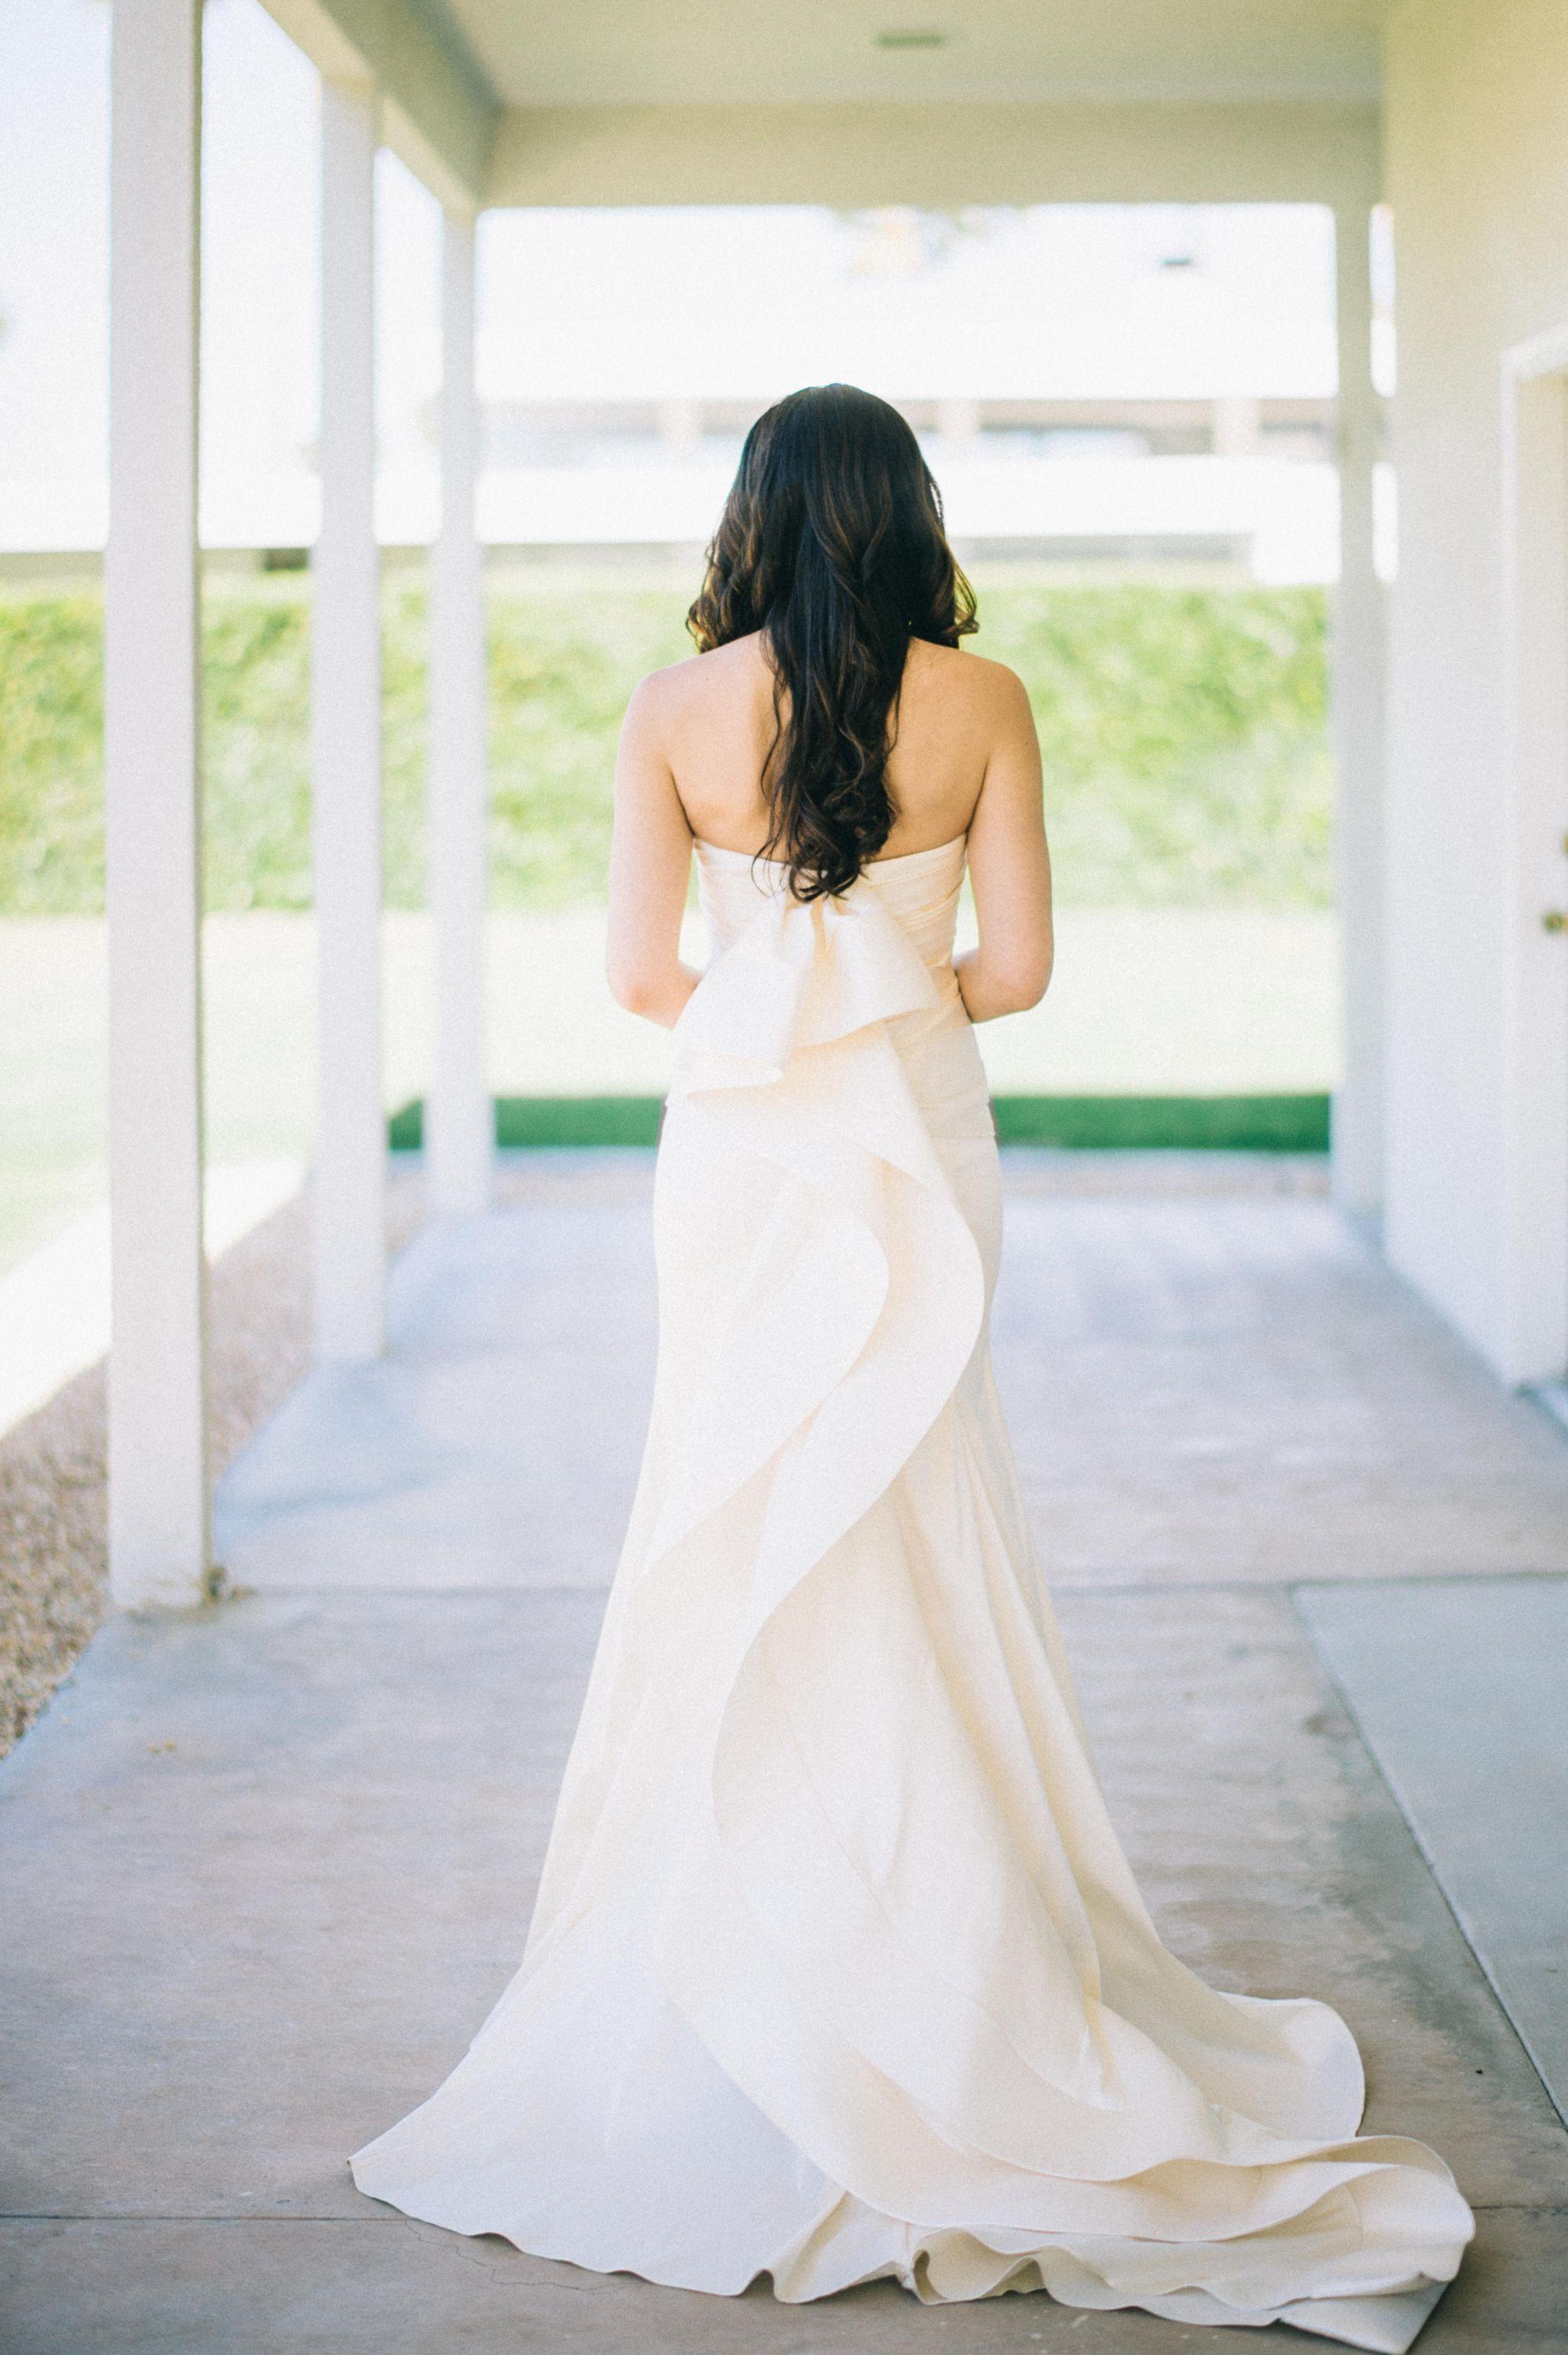 Oscar De La Renta Caroline Wedding Dress Used Size 8 2 500